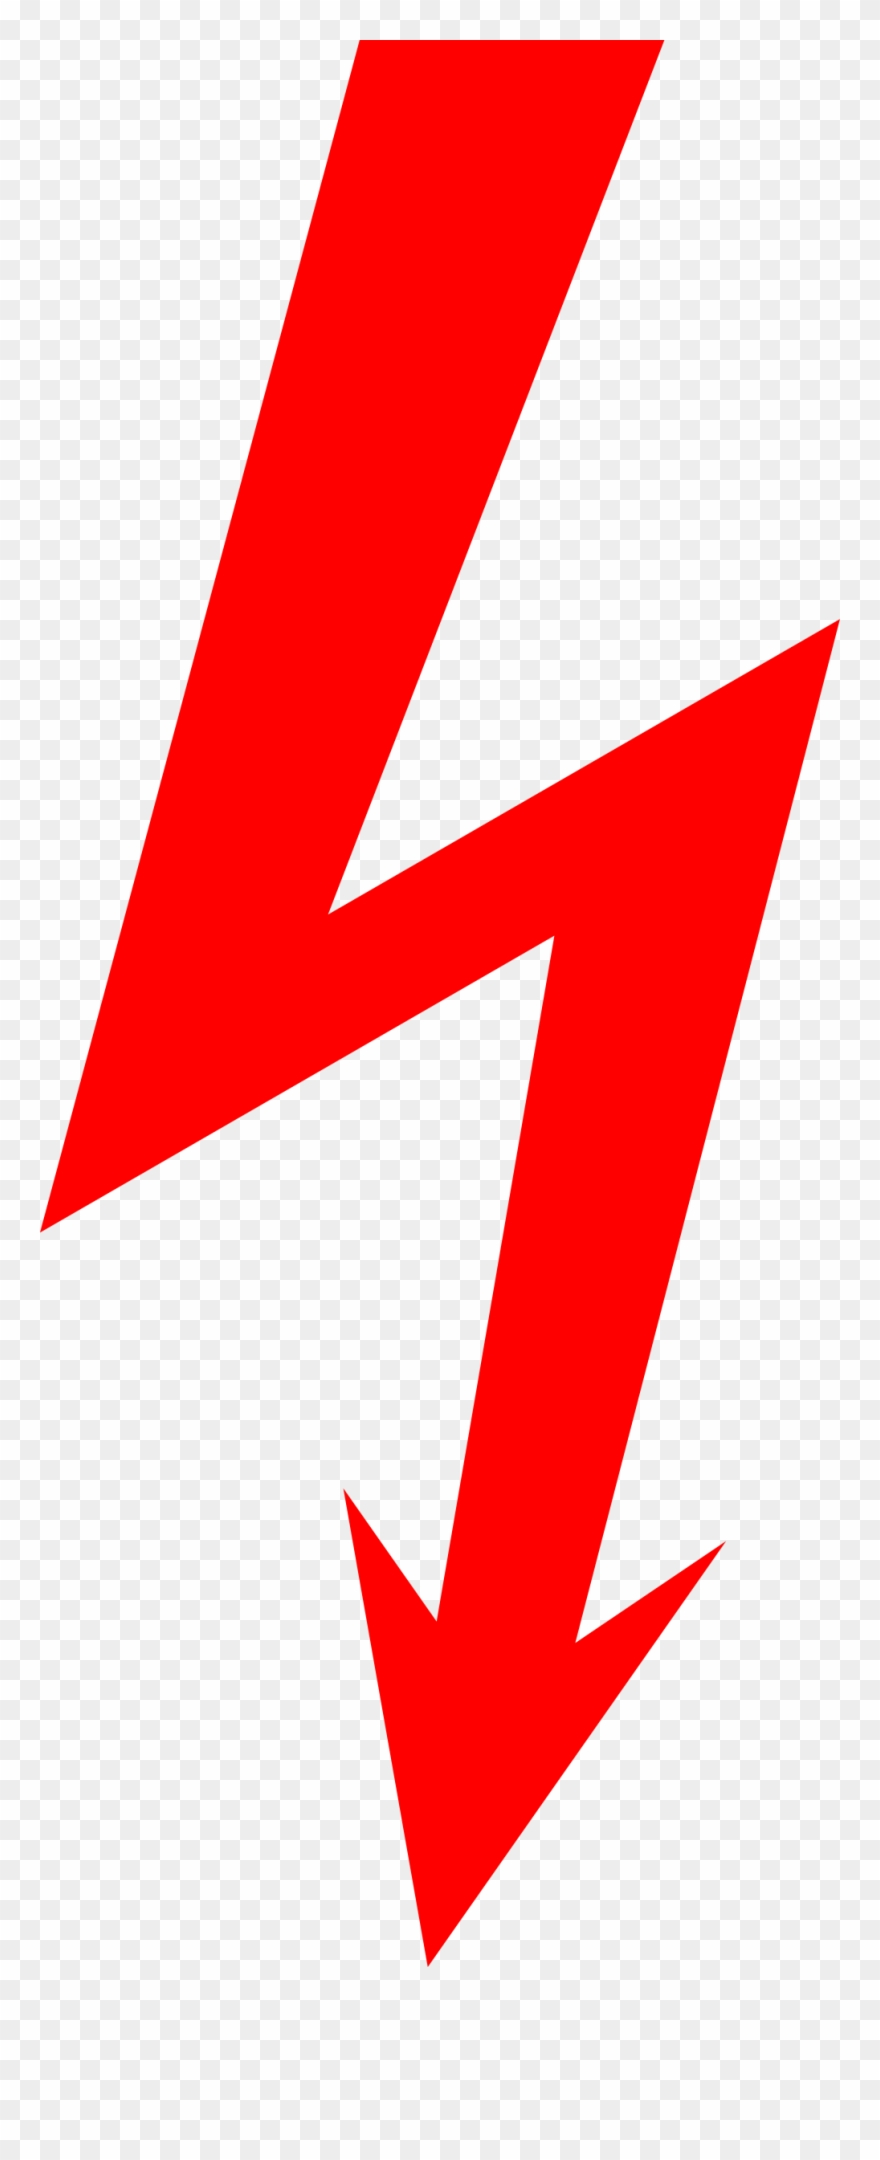 Electric Sign «lightning» - Electric Symbol Lightning